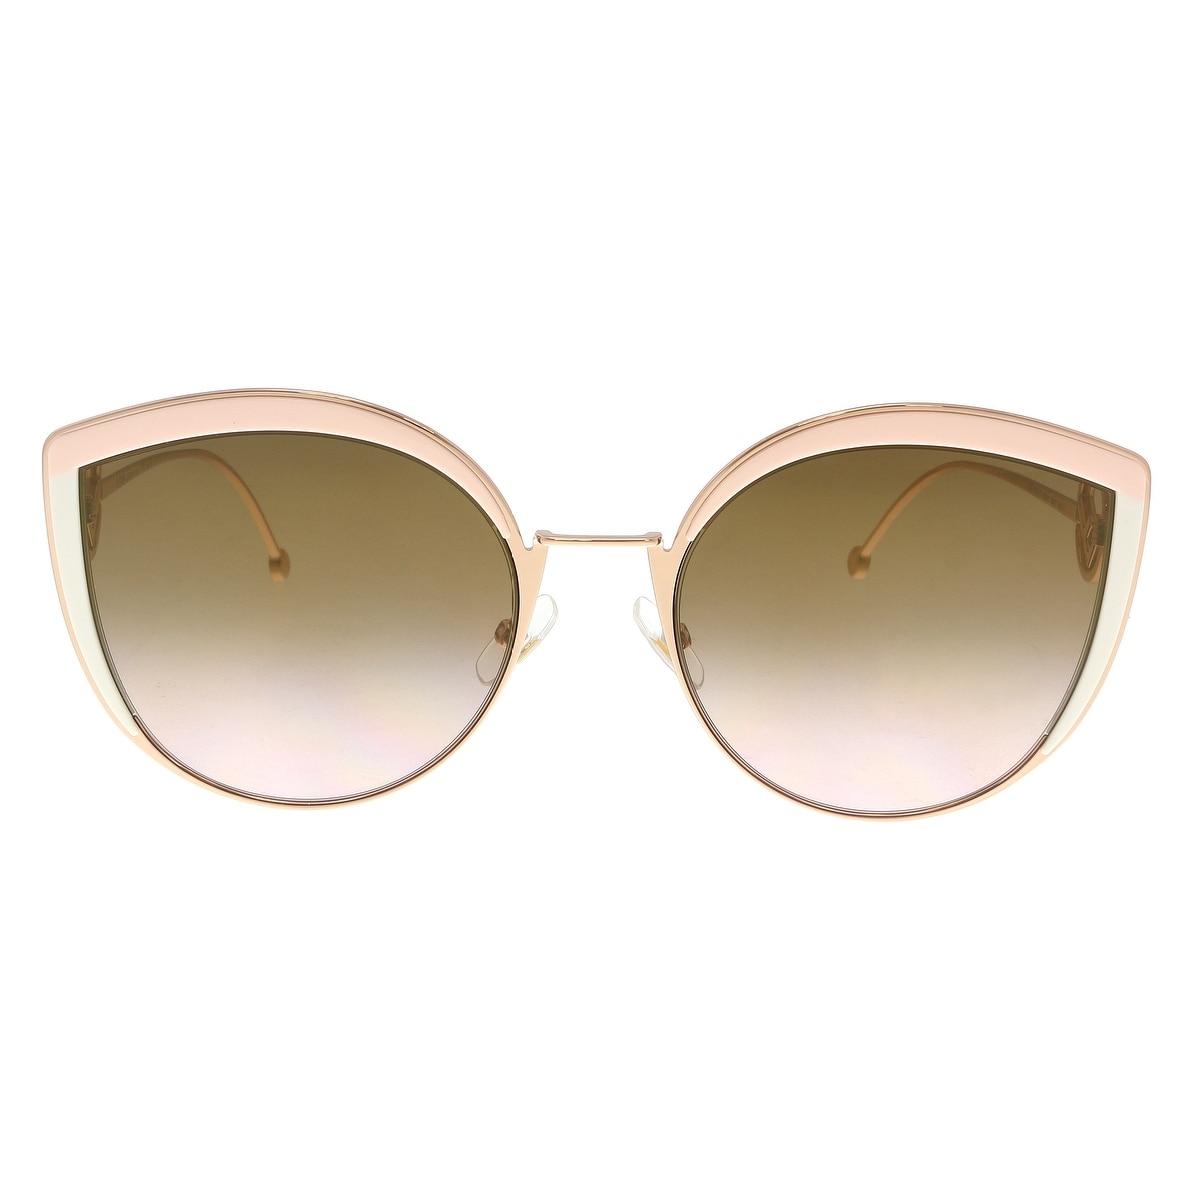 3e51565d69fe Shop FENDI 0290 S 53 035J Pink Cateye Sunglasses - 58-21-140 - Ships To  Canada - Overstock - 22818038